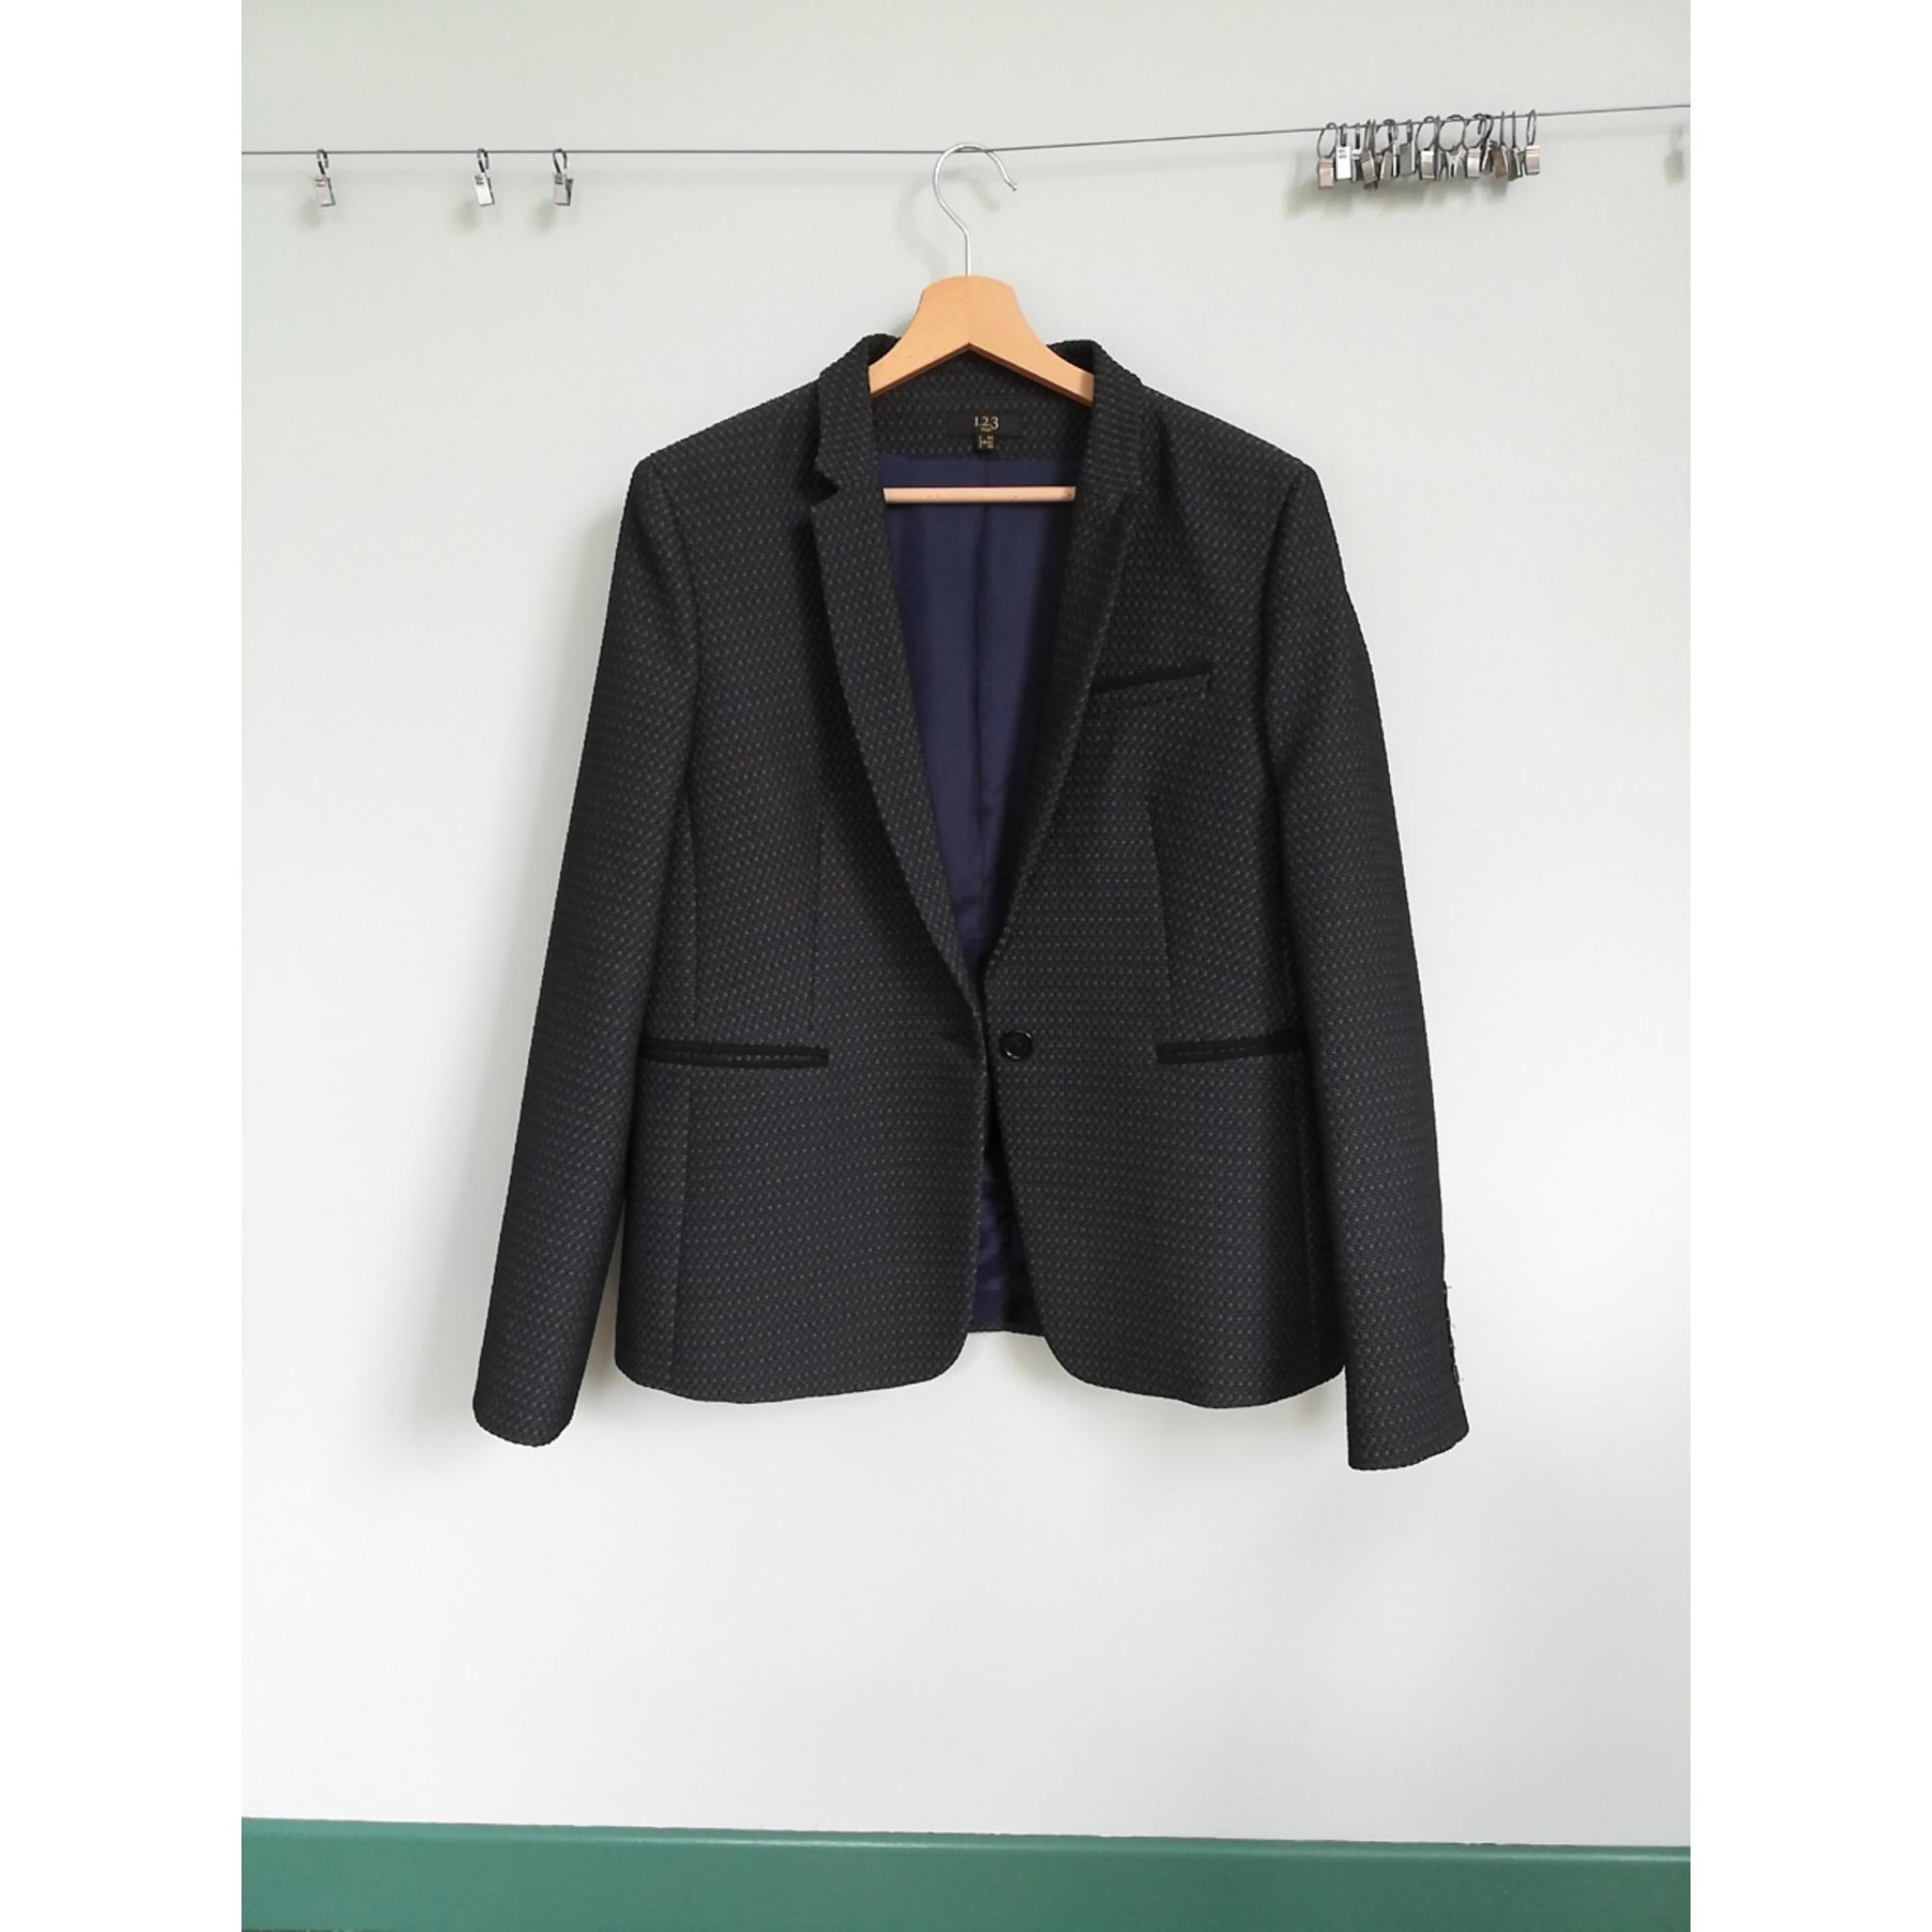 Blazer, veste tailleur 1.2.3 Bleu, bleu marine, bleu turquoise